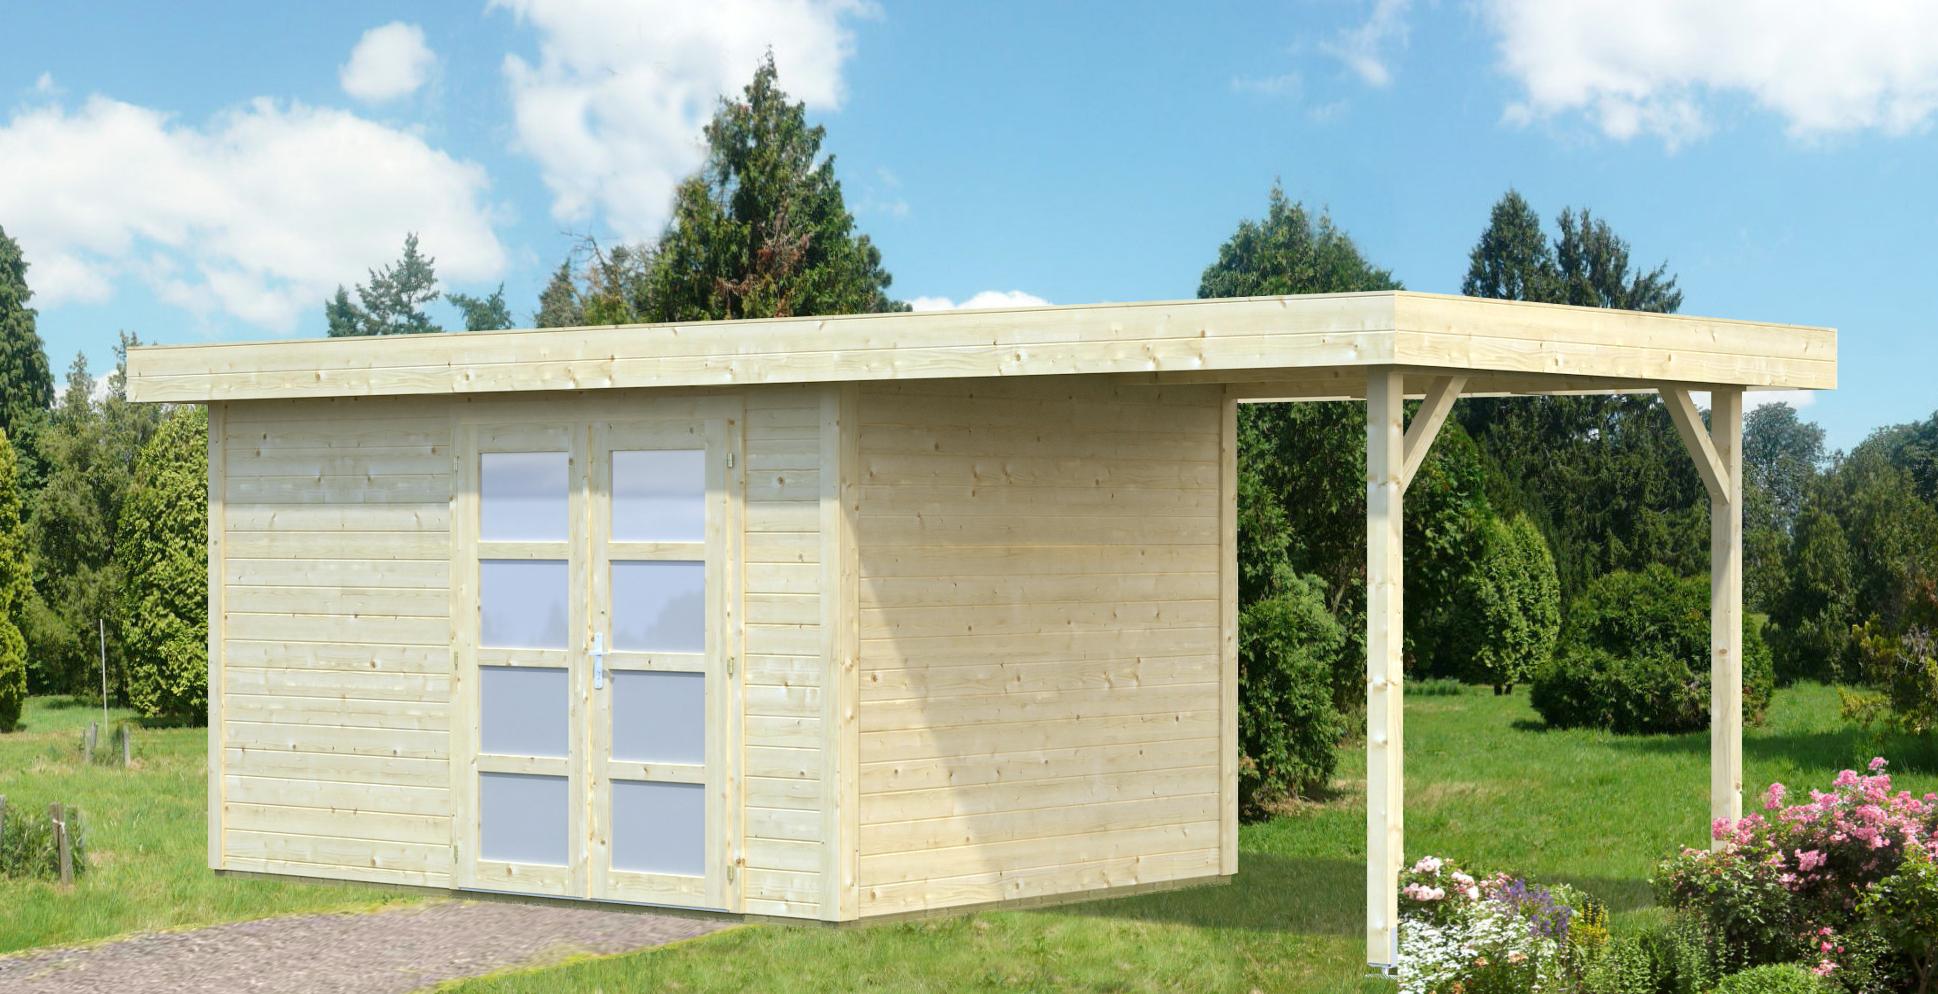 palmako gartenhaus lara 8 4 5 9 m frb28 5925. Black Bedroom Furniture Sets. Home Design Ideas